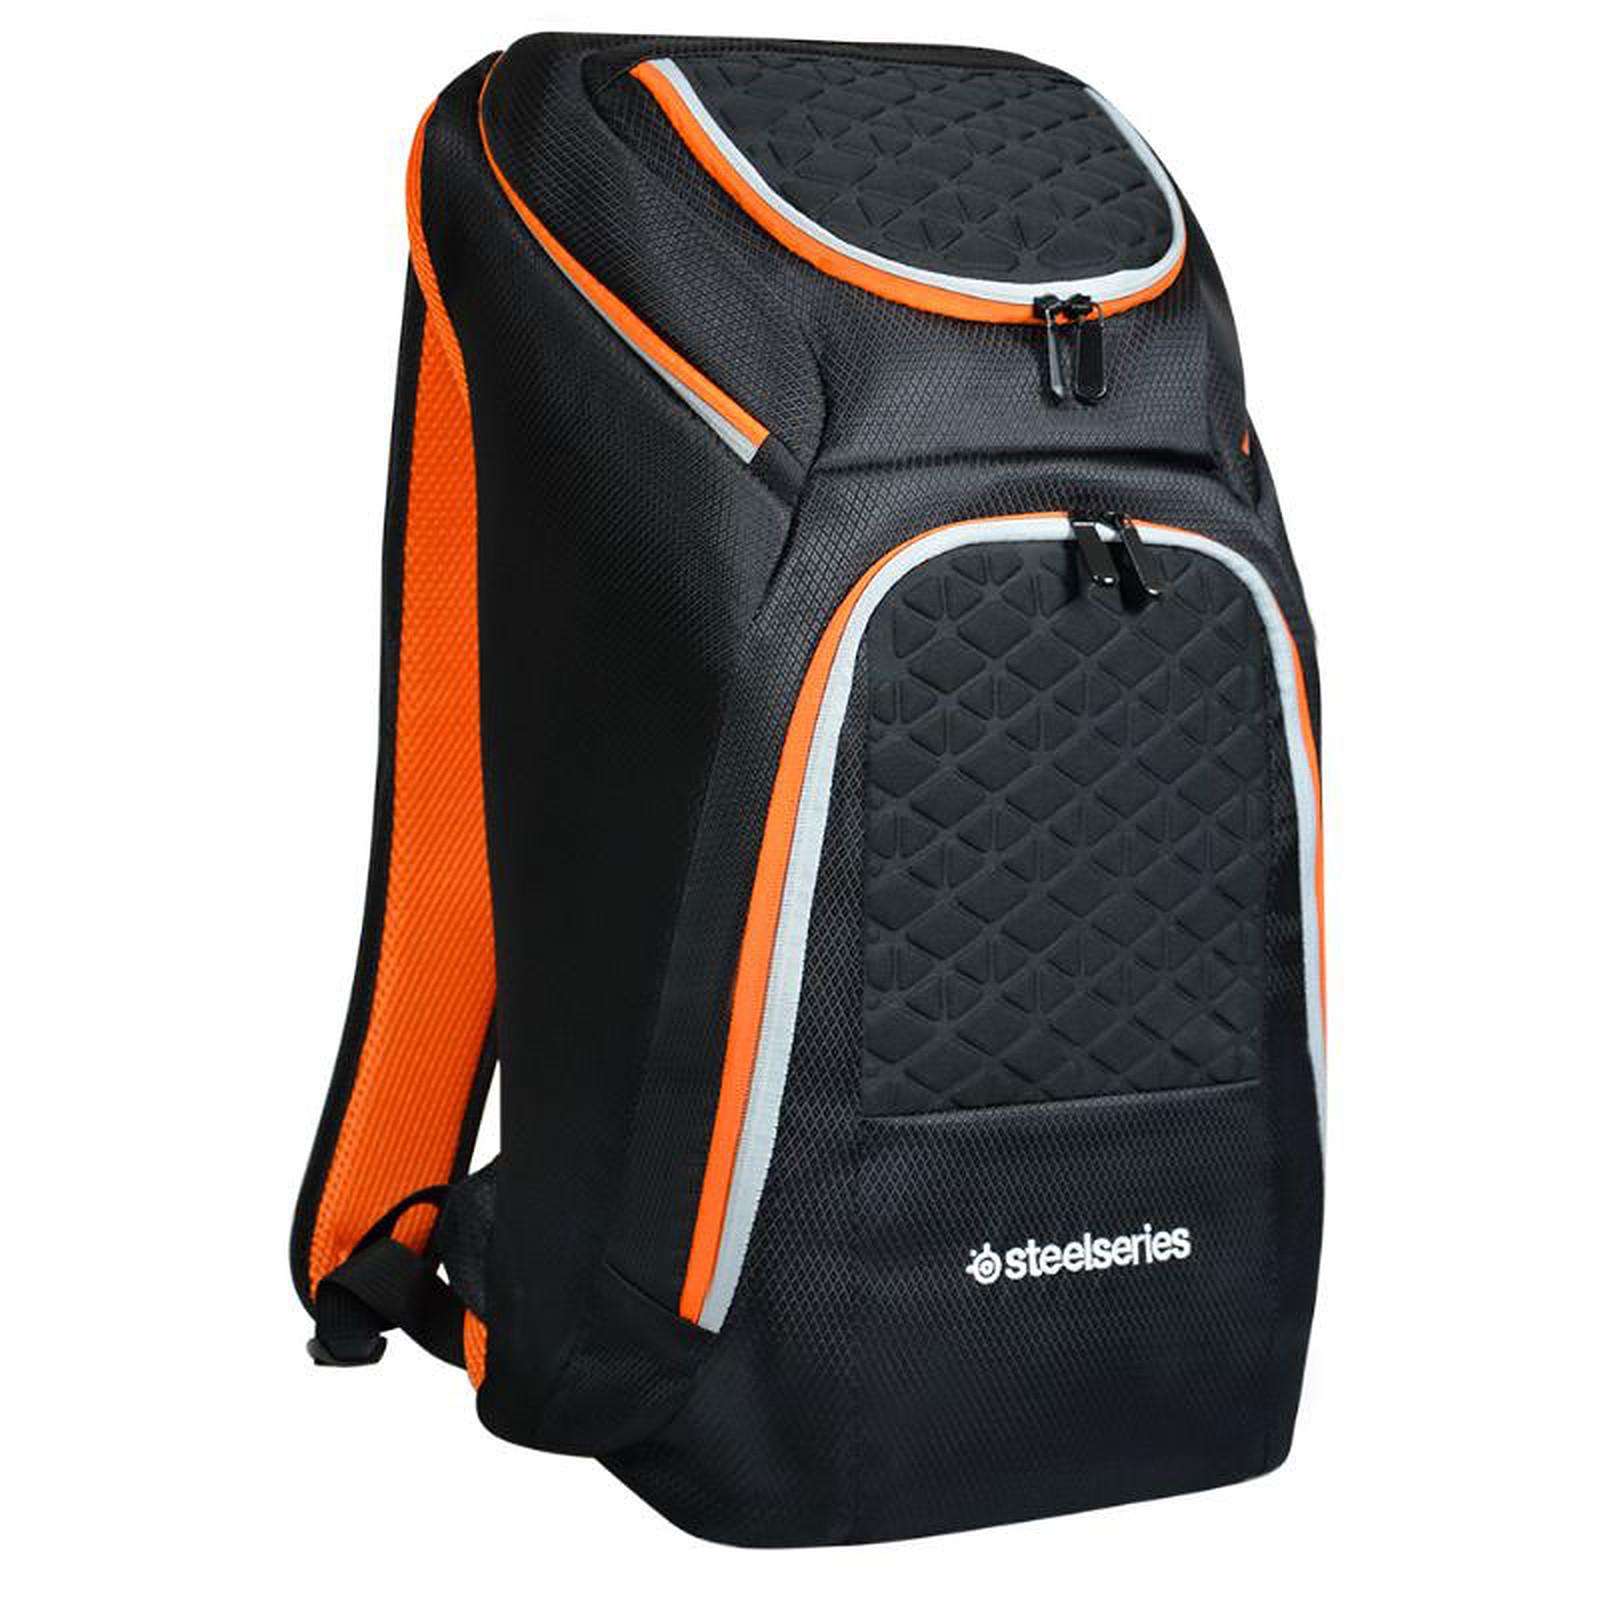 PORT Designs feat. SteelSeries Gaming Backpack